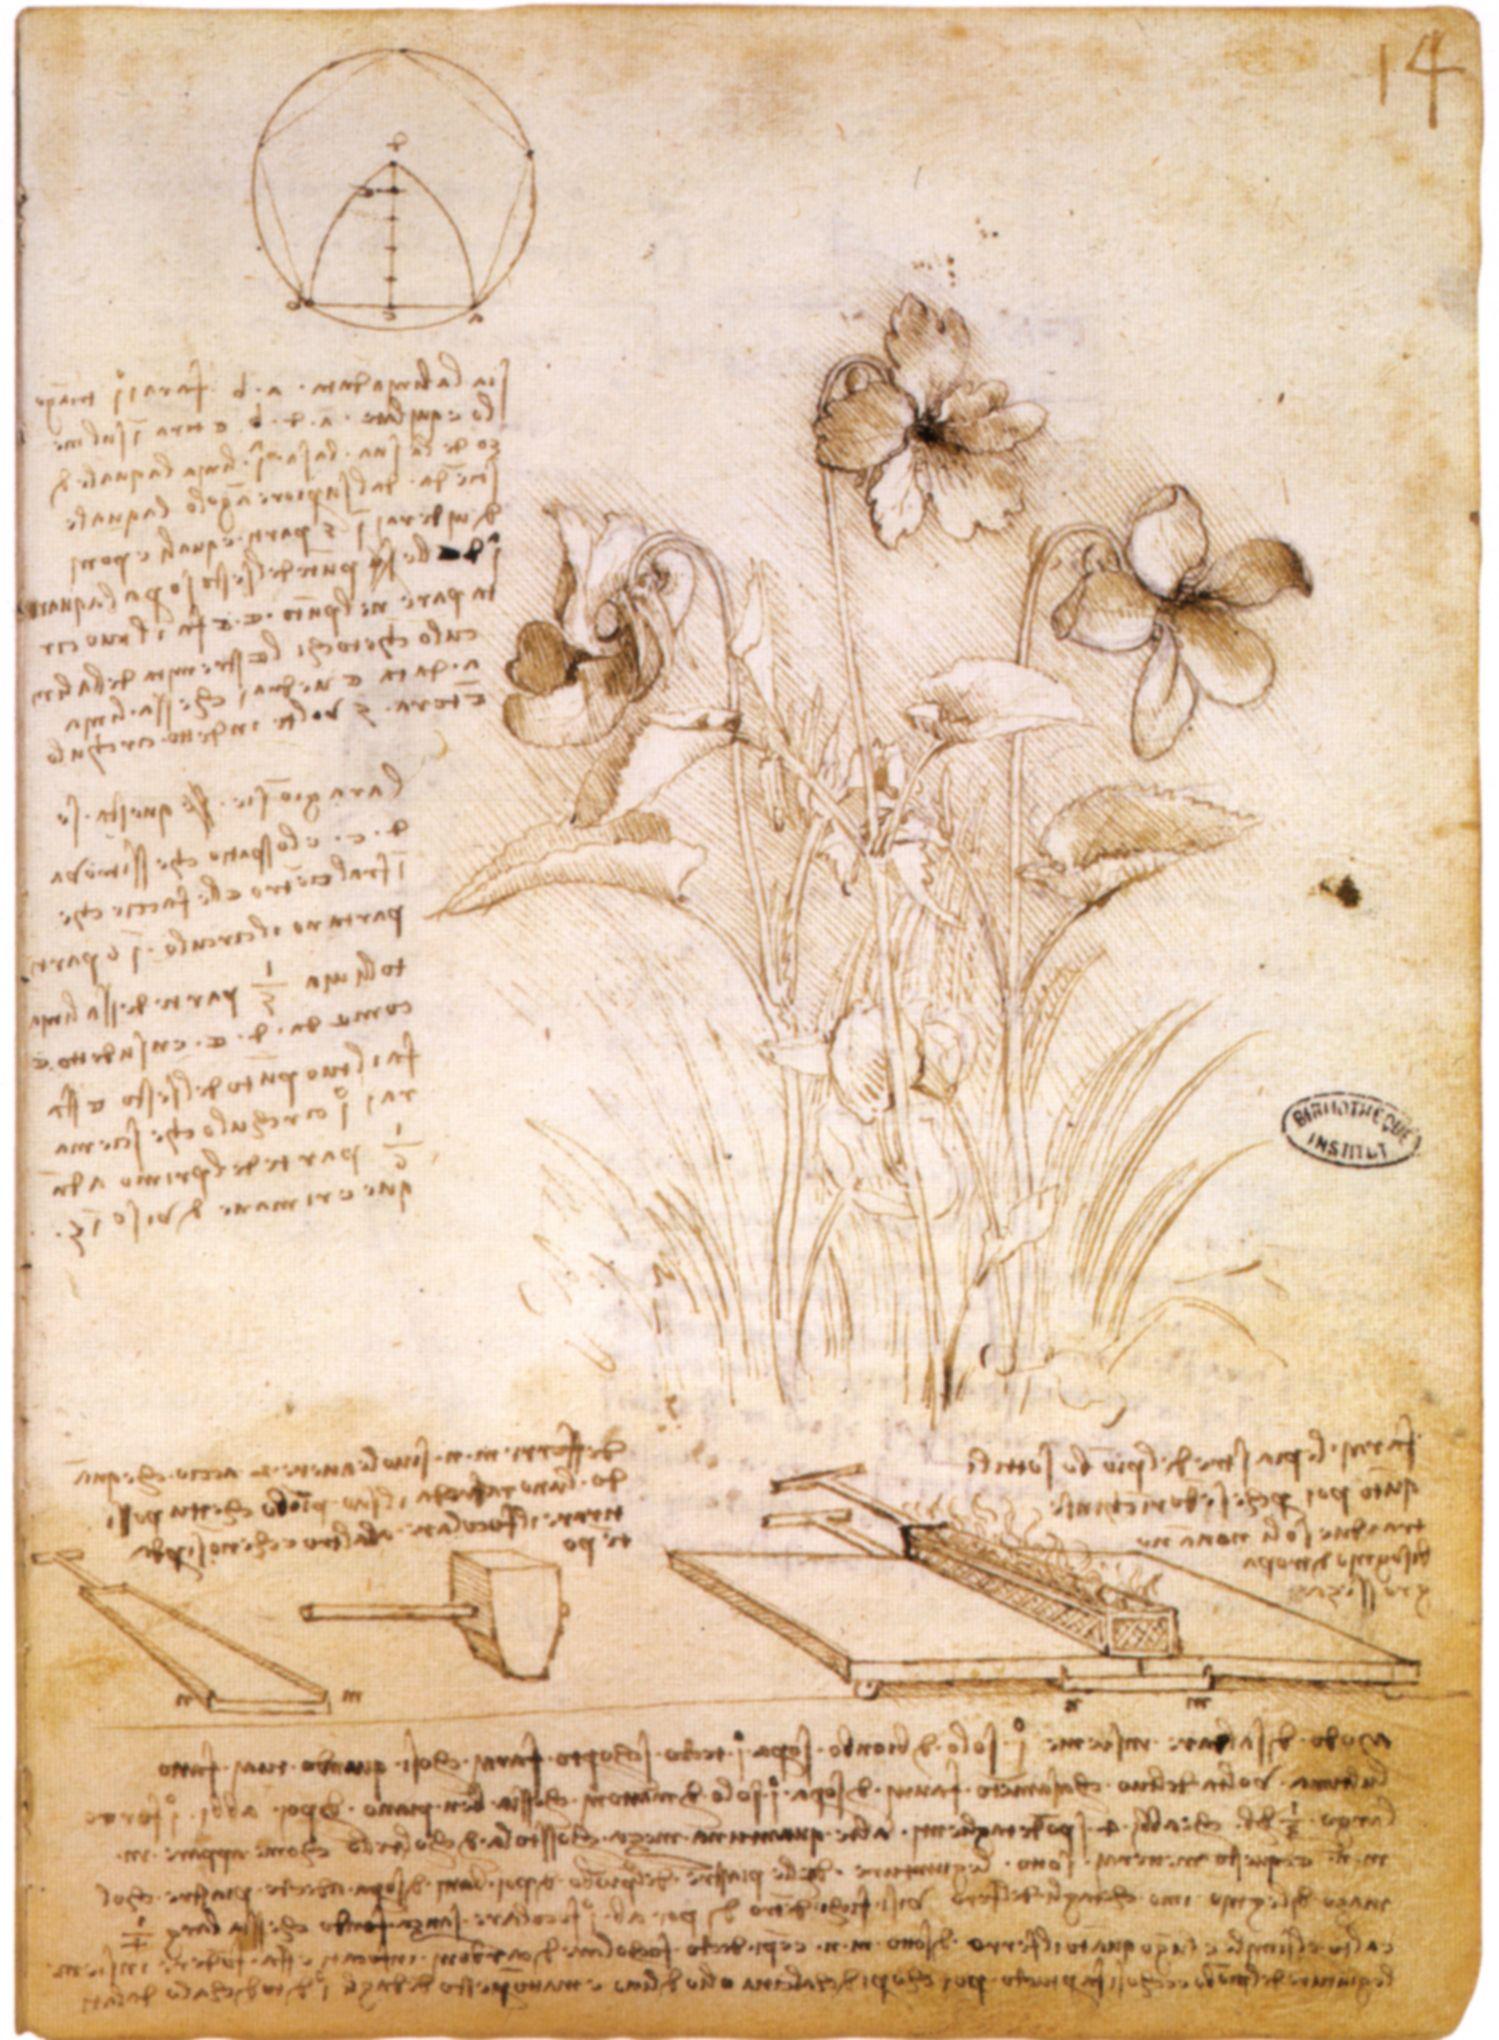 leonardo da vinci figure geometriche e disegno botanico 1490 circa parigi leonardo. Black Bedroom Furniture Sets. Home Design Ideas